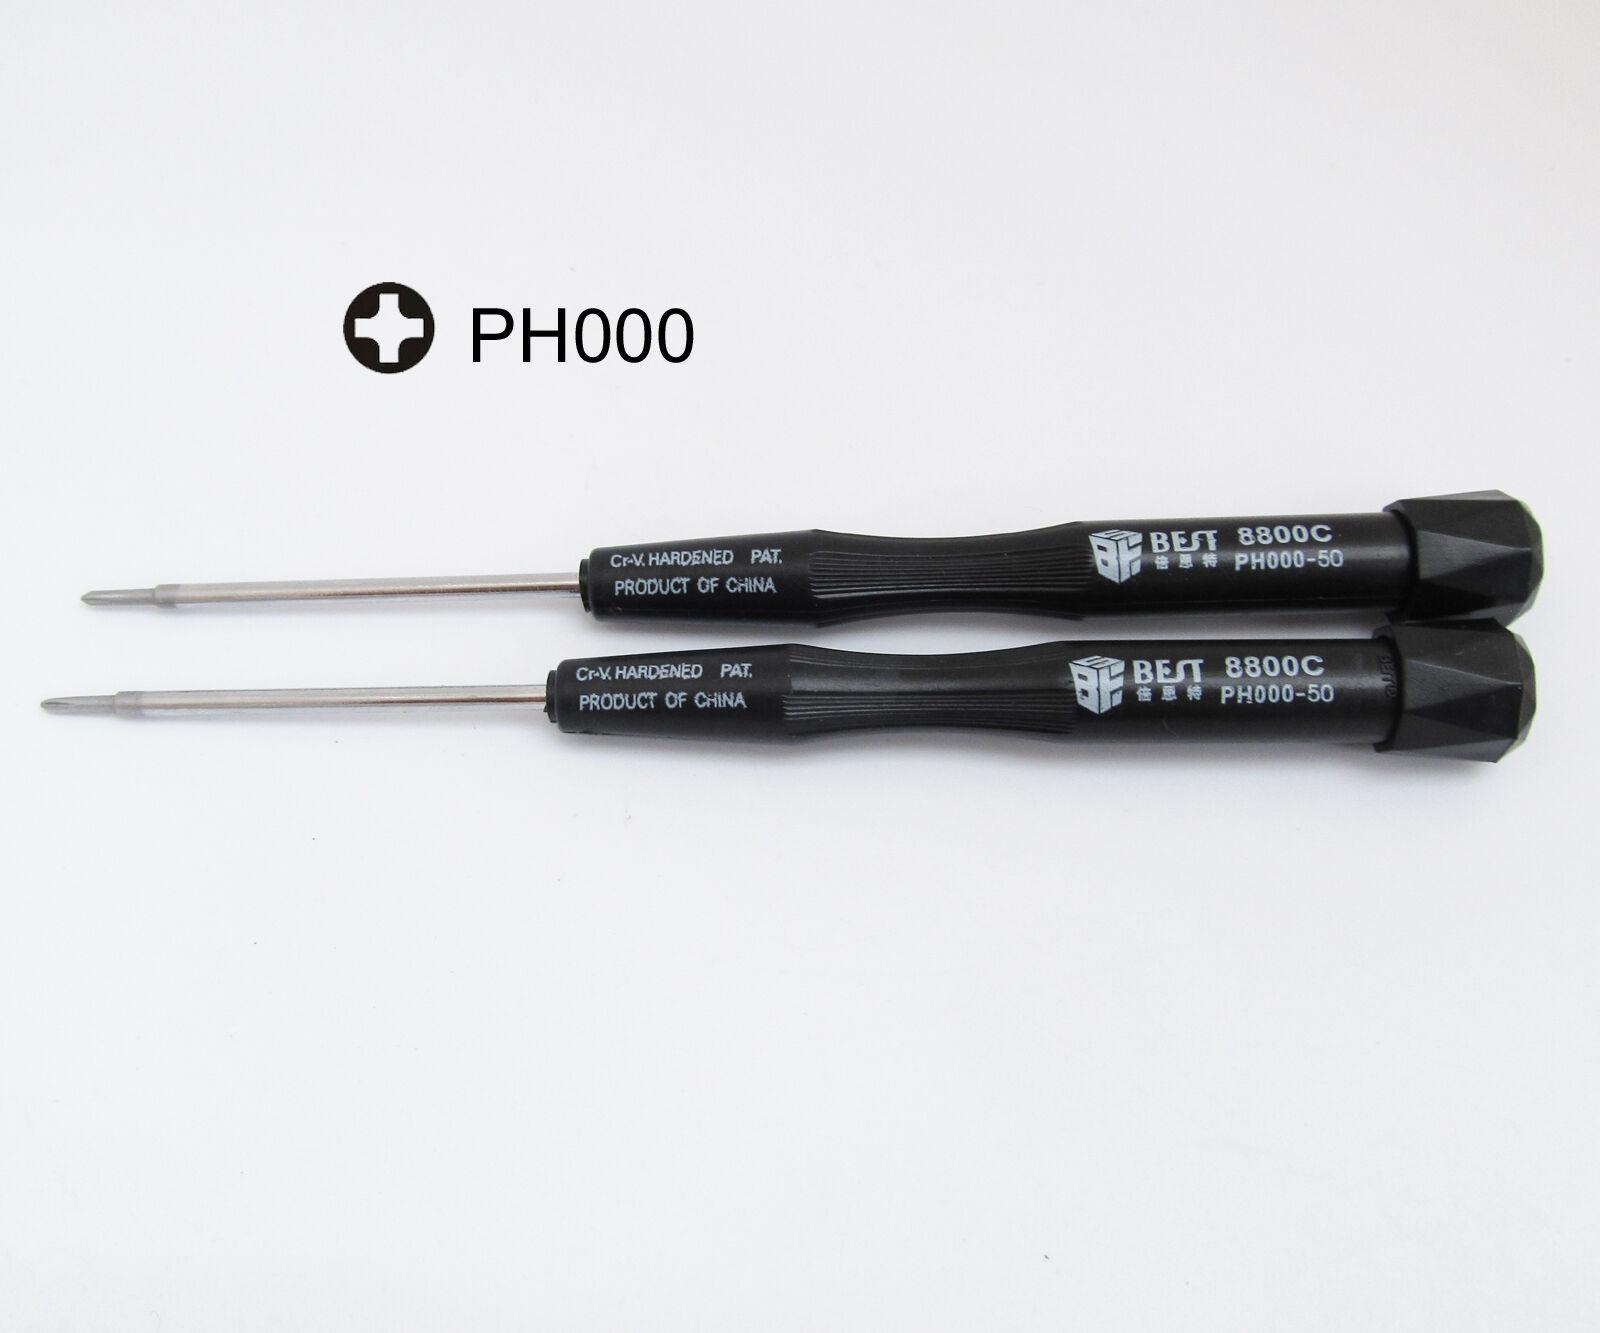 50x Phillips 000 PH000 Precision Screwdriver Phone Laptop Repair Tool Best 8800C